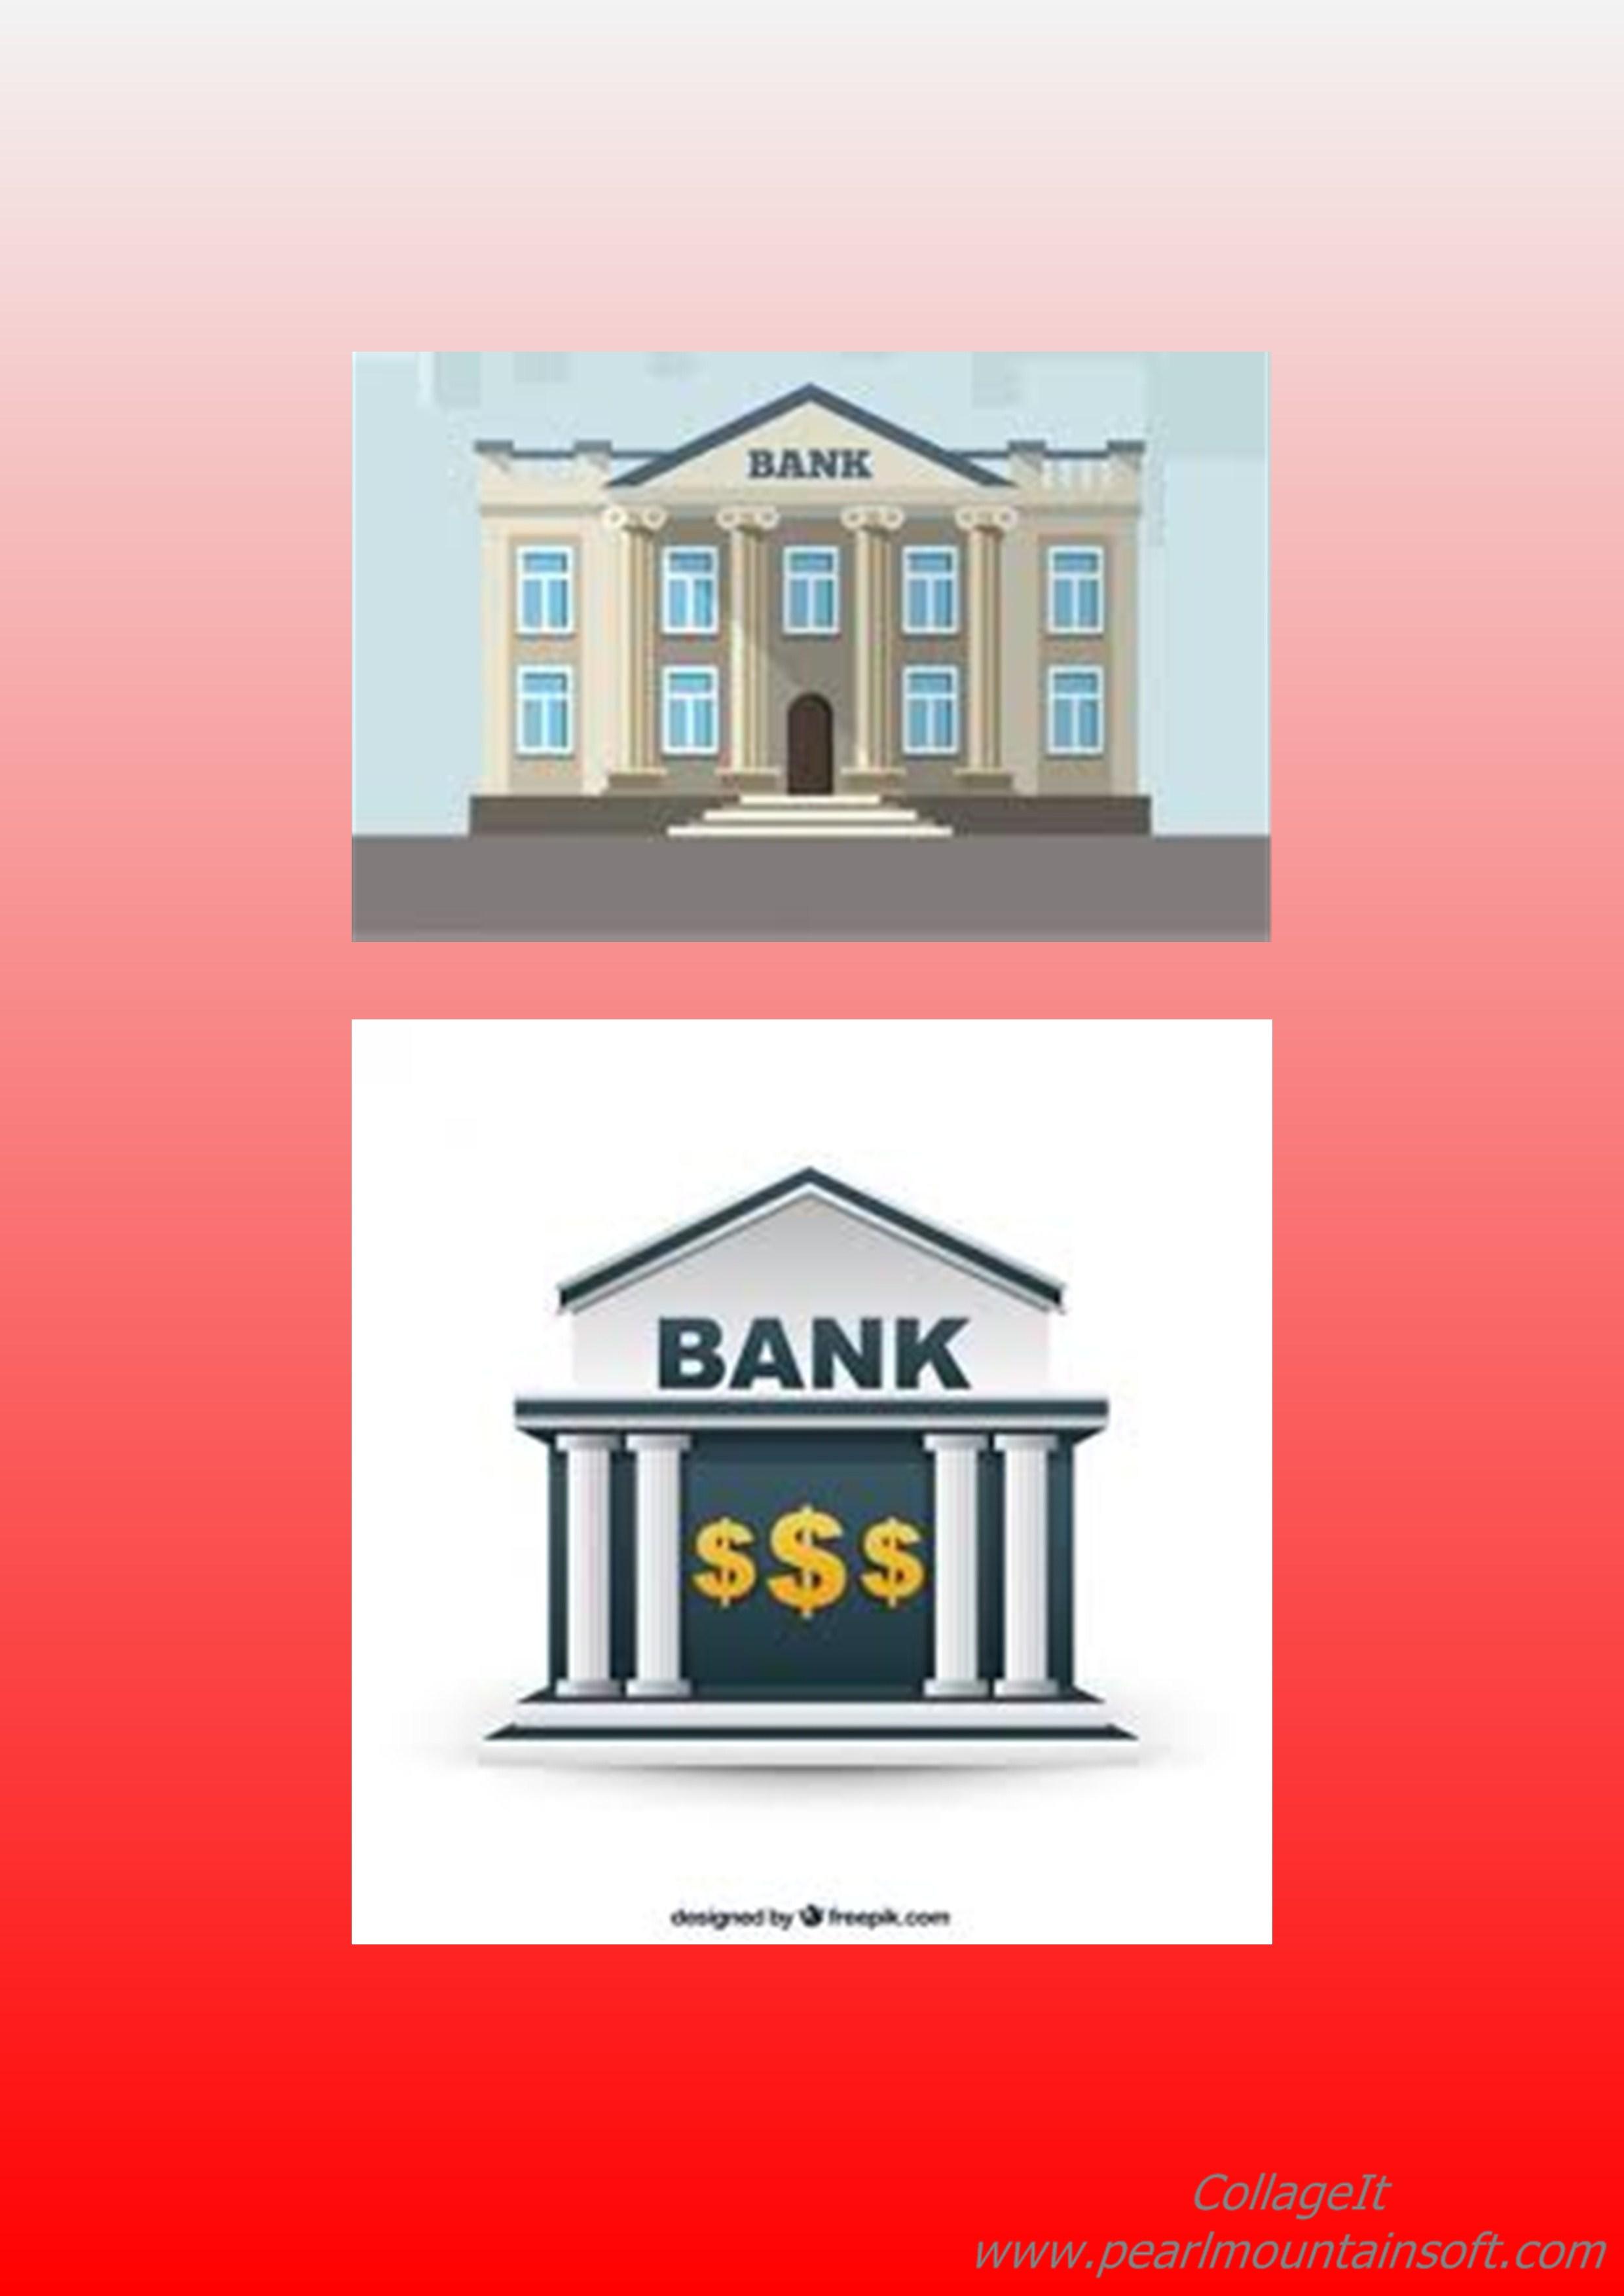 BANKS IN NIGERIA, THEIR PHONE NUMBERS, HEADQUARTERS AND INSTAGRAM HANDLES